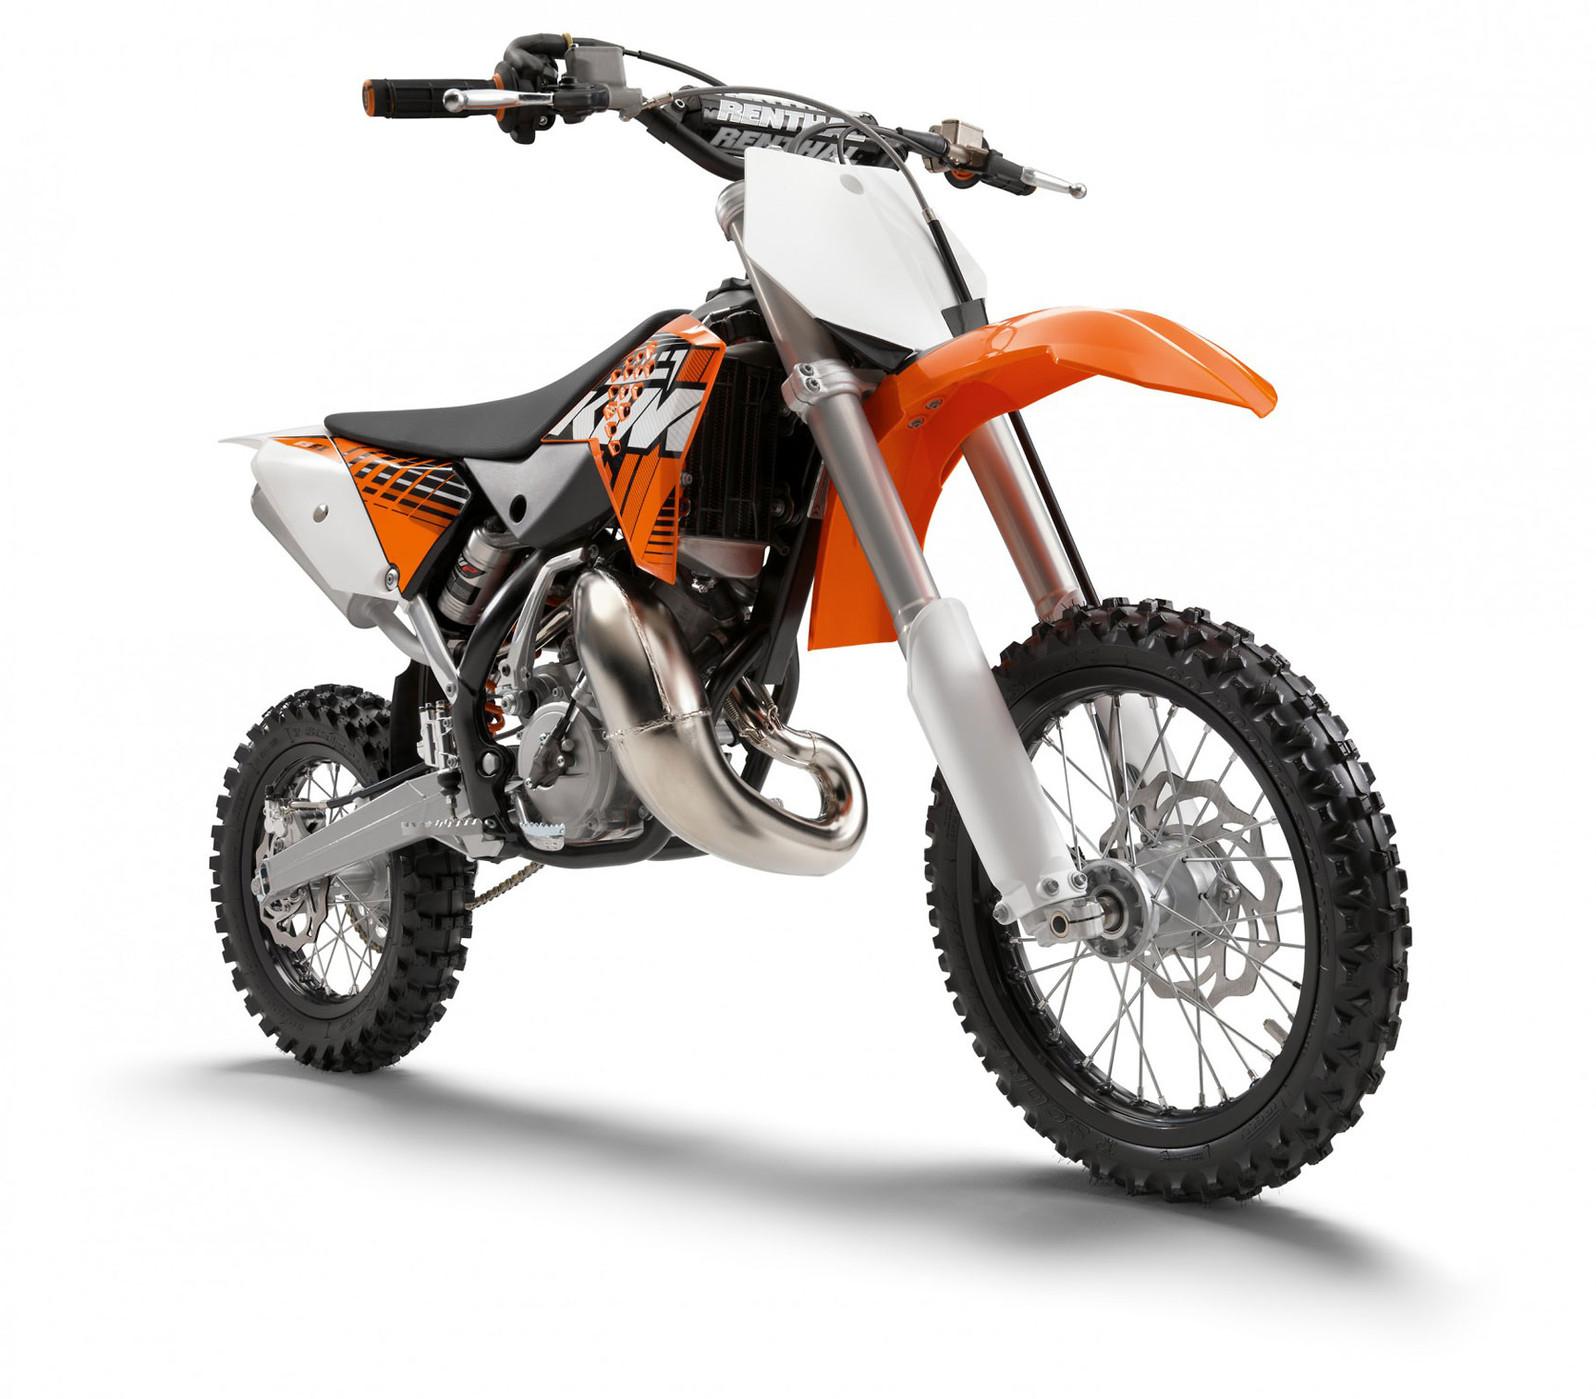 2012 ktm 65 sx reviews comparisons specs motocross dirt bike bikes vital mx. Black Bedroom Furniture Sets. Home Design Ideas